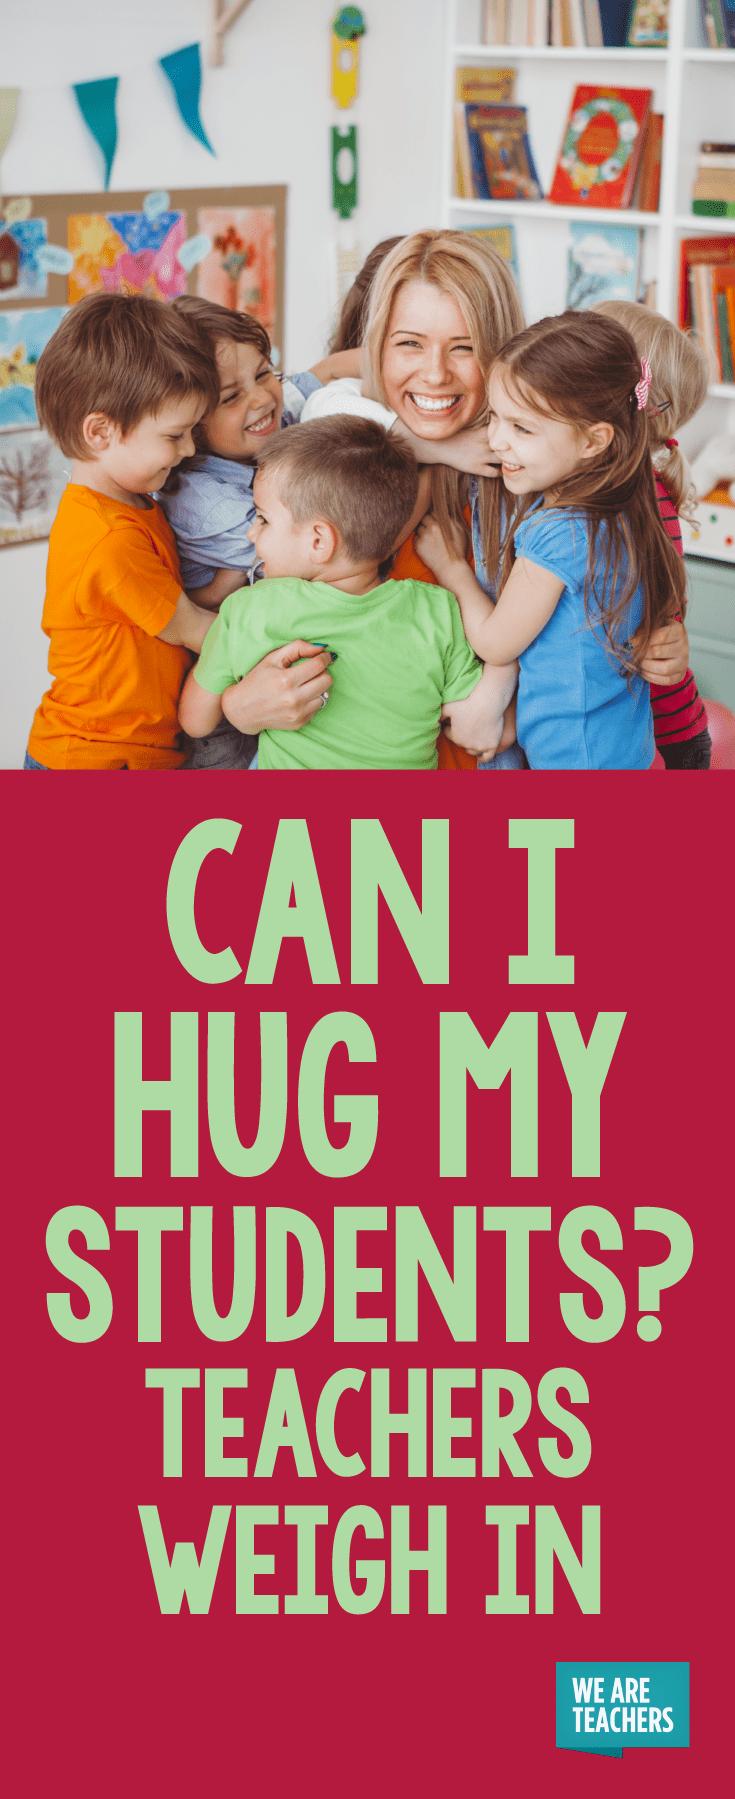 Can I Hug My Students? Teachers Weigh In - WeAreTeachers